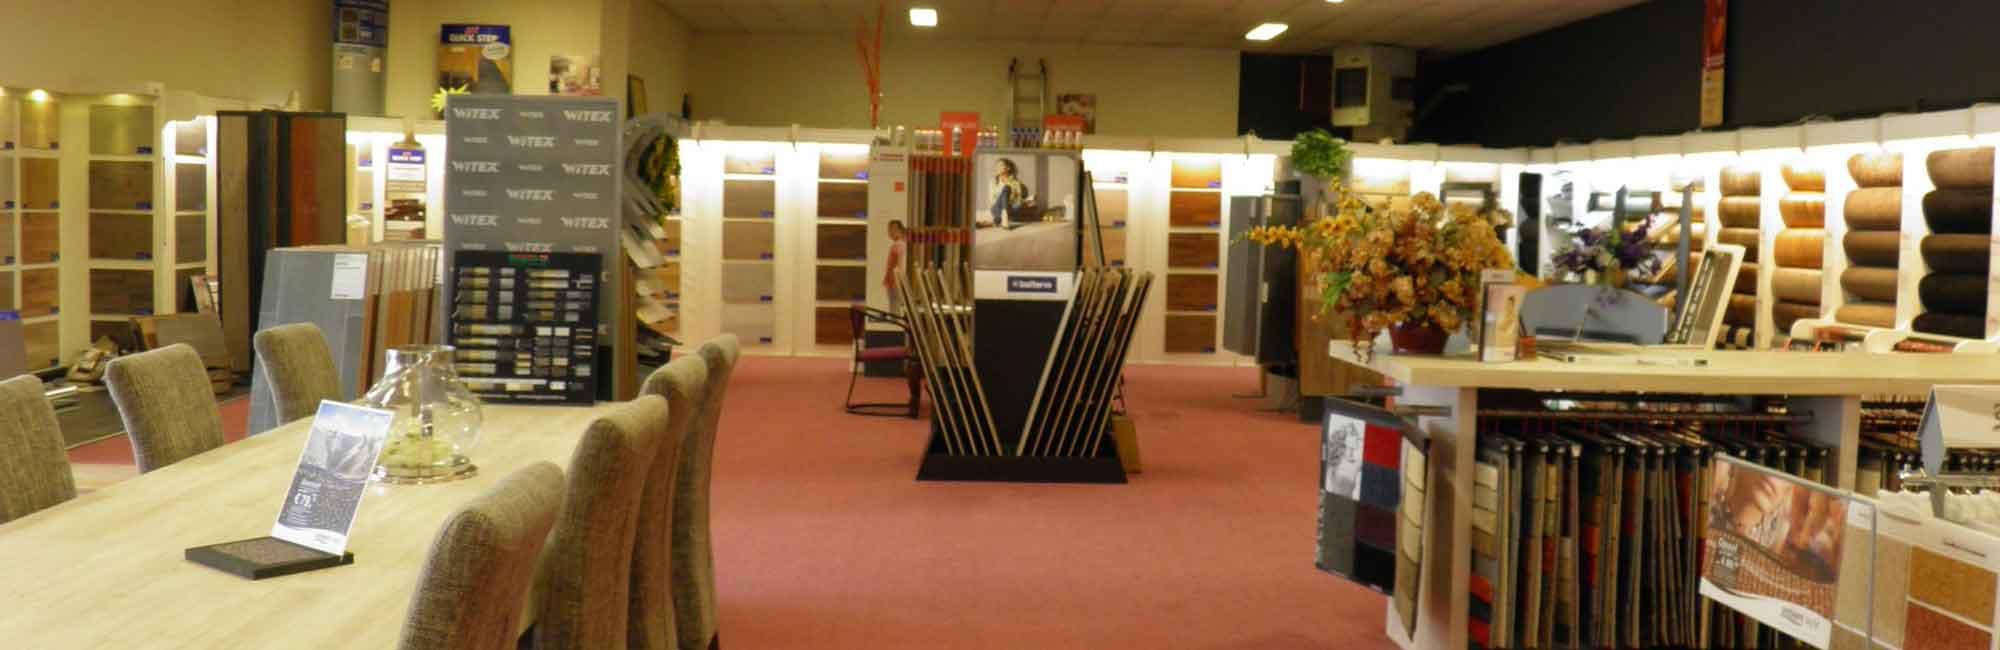 800m2 showroom - Tapijt Paradijs Oude Pekela